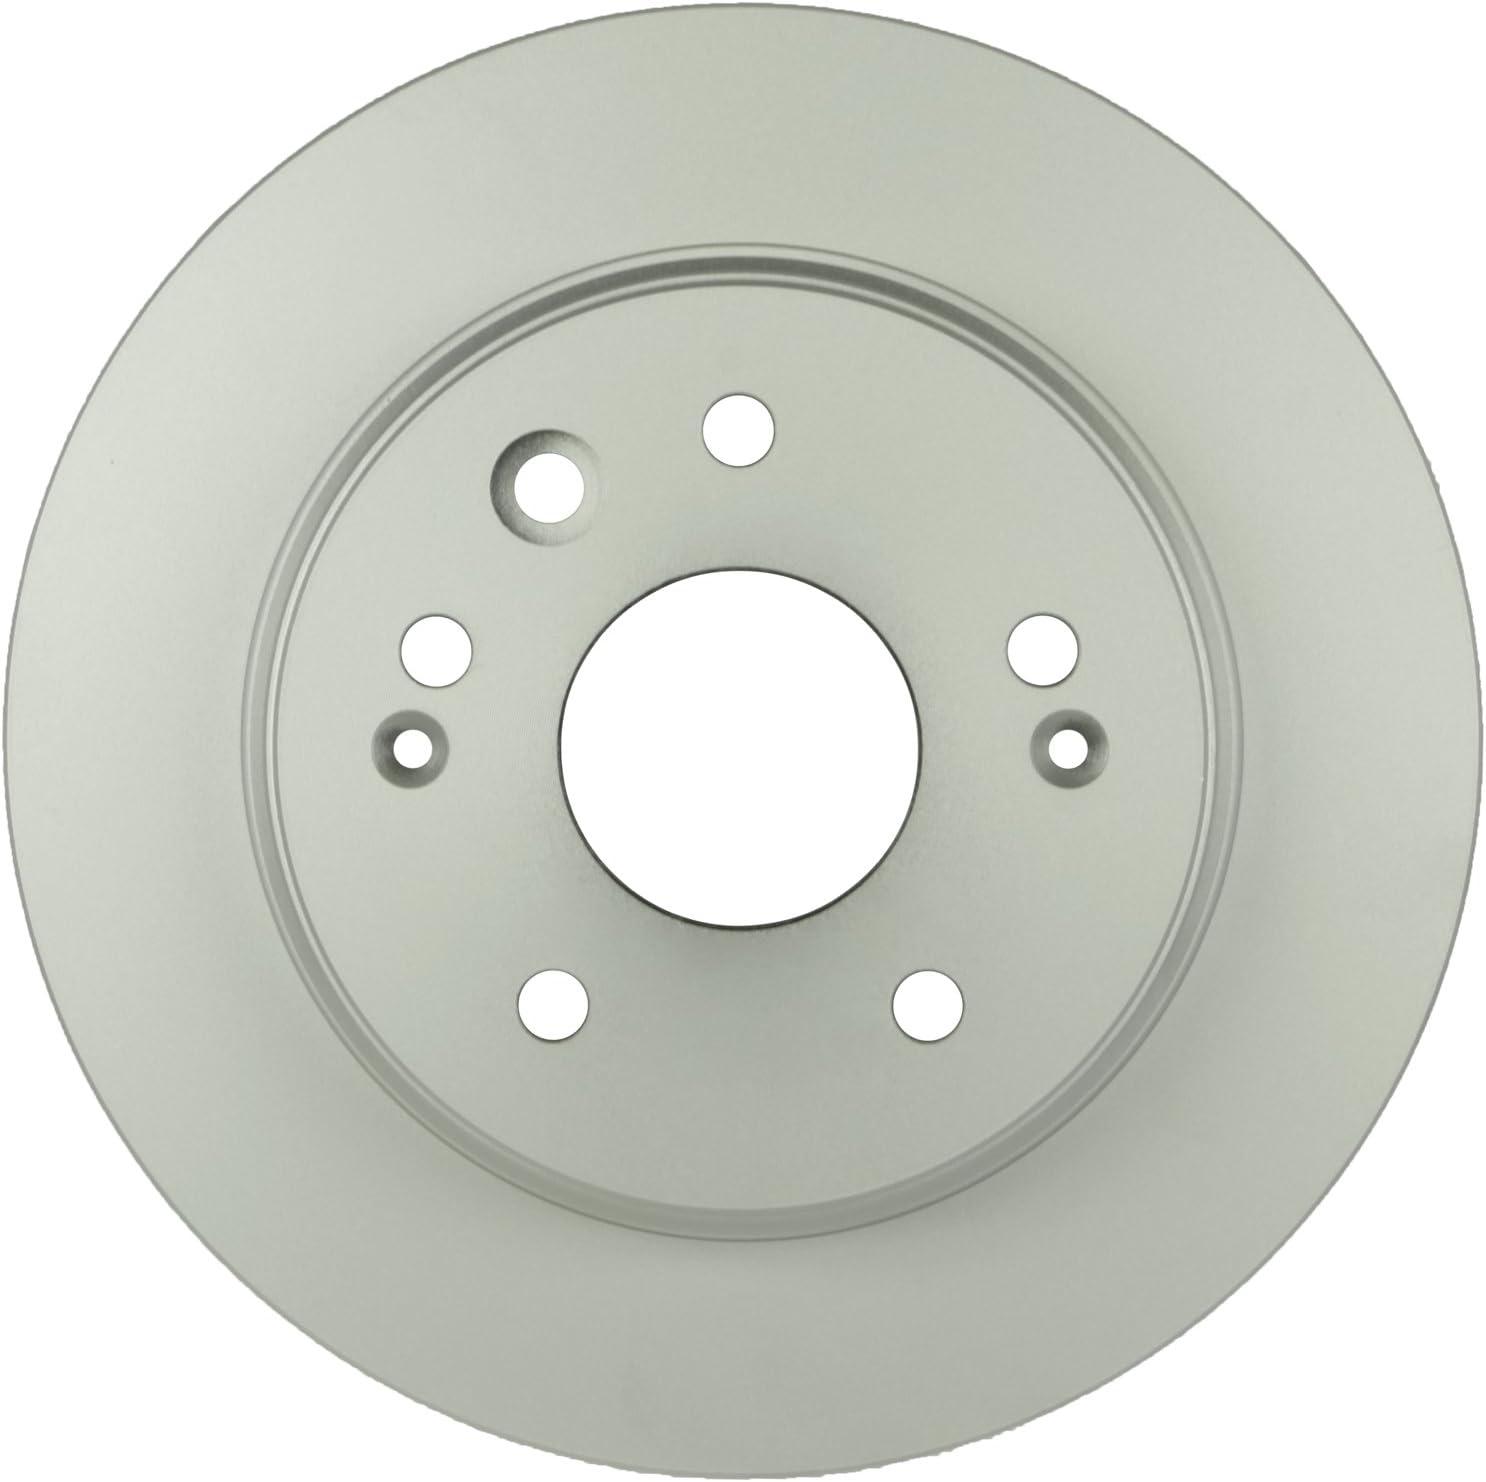 Bosch 26010749 QuietCast Premium Disc Brake Rotor For 1999-2003 Acura TL; Rear